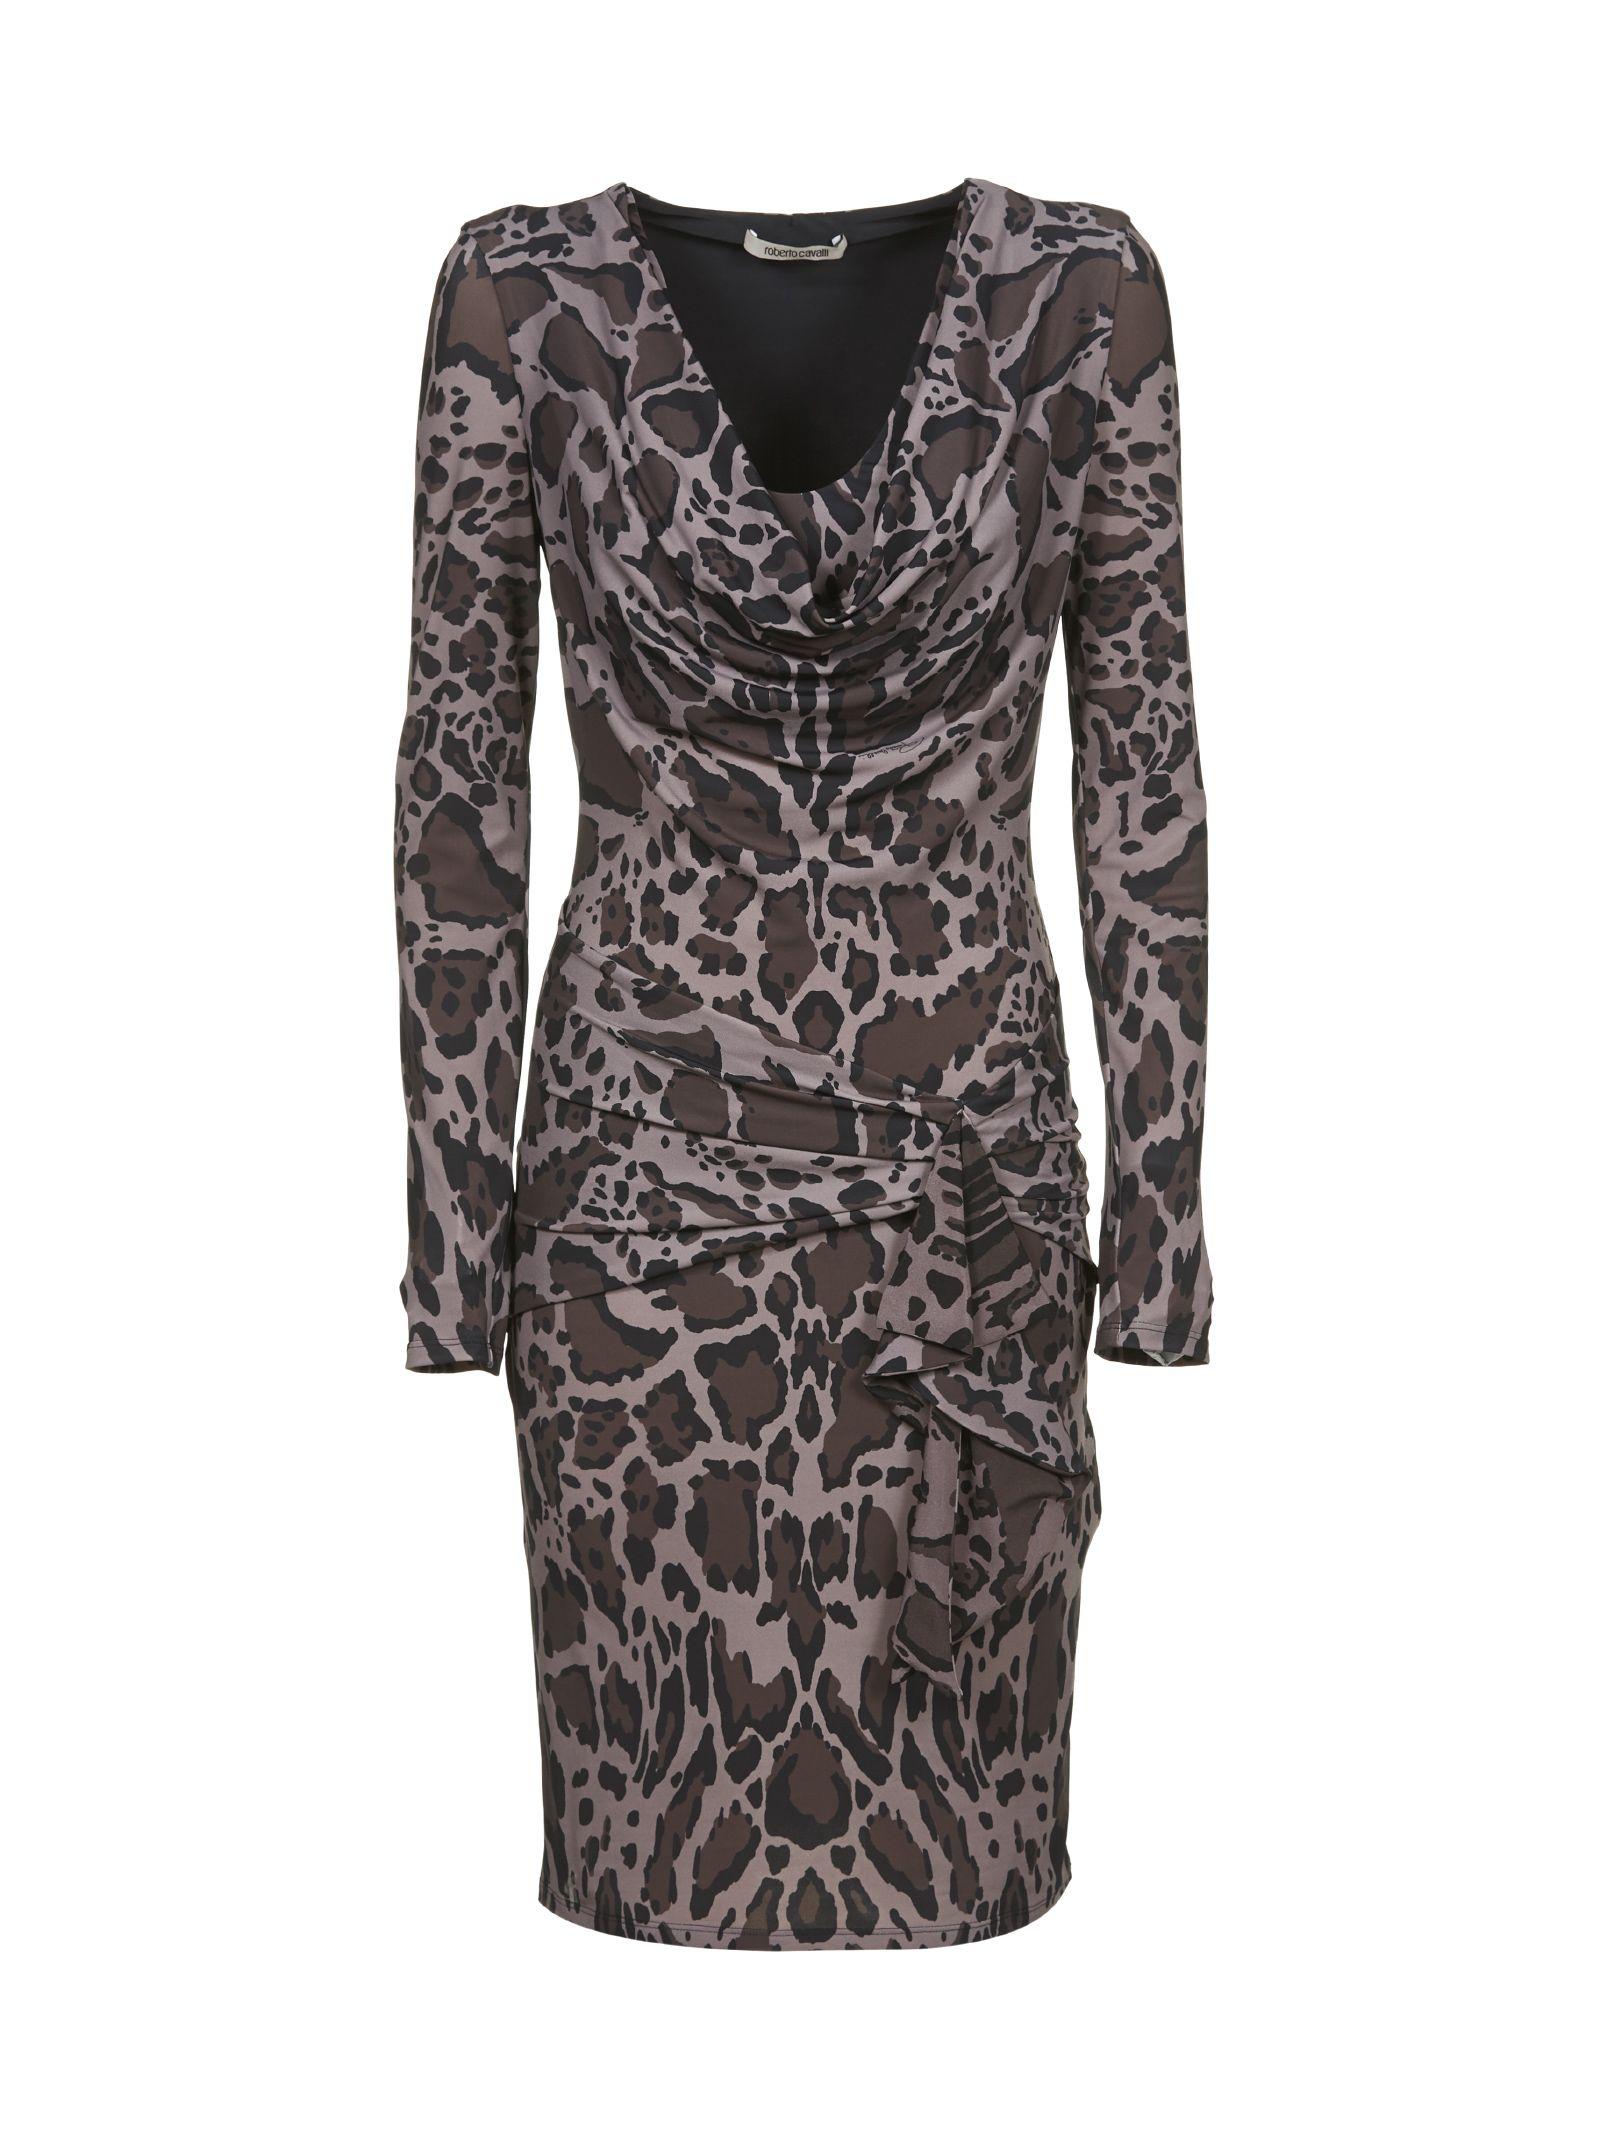 Roberto Cavalli Ruched Leopard Dress